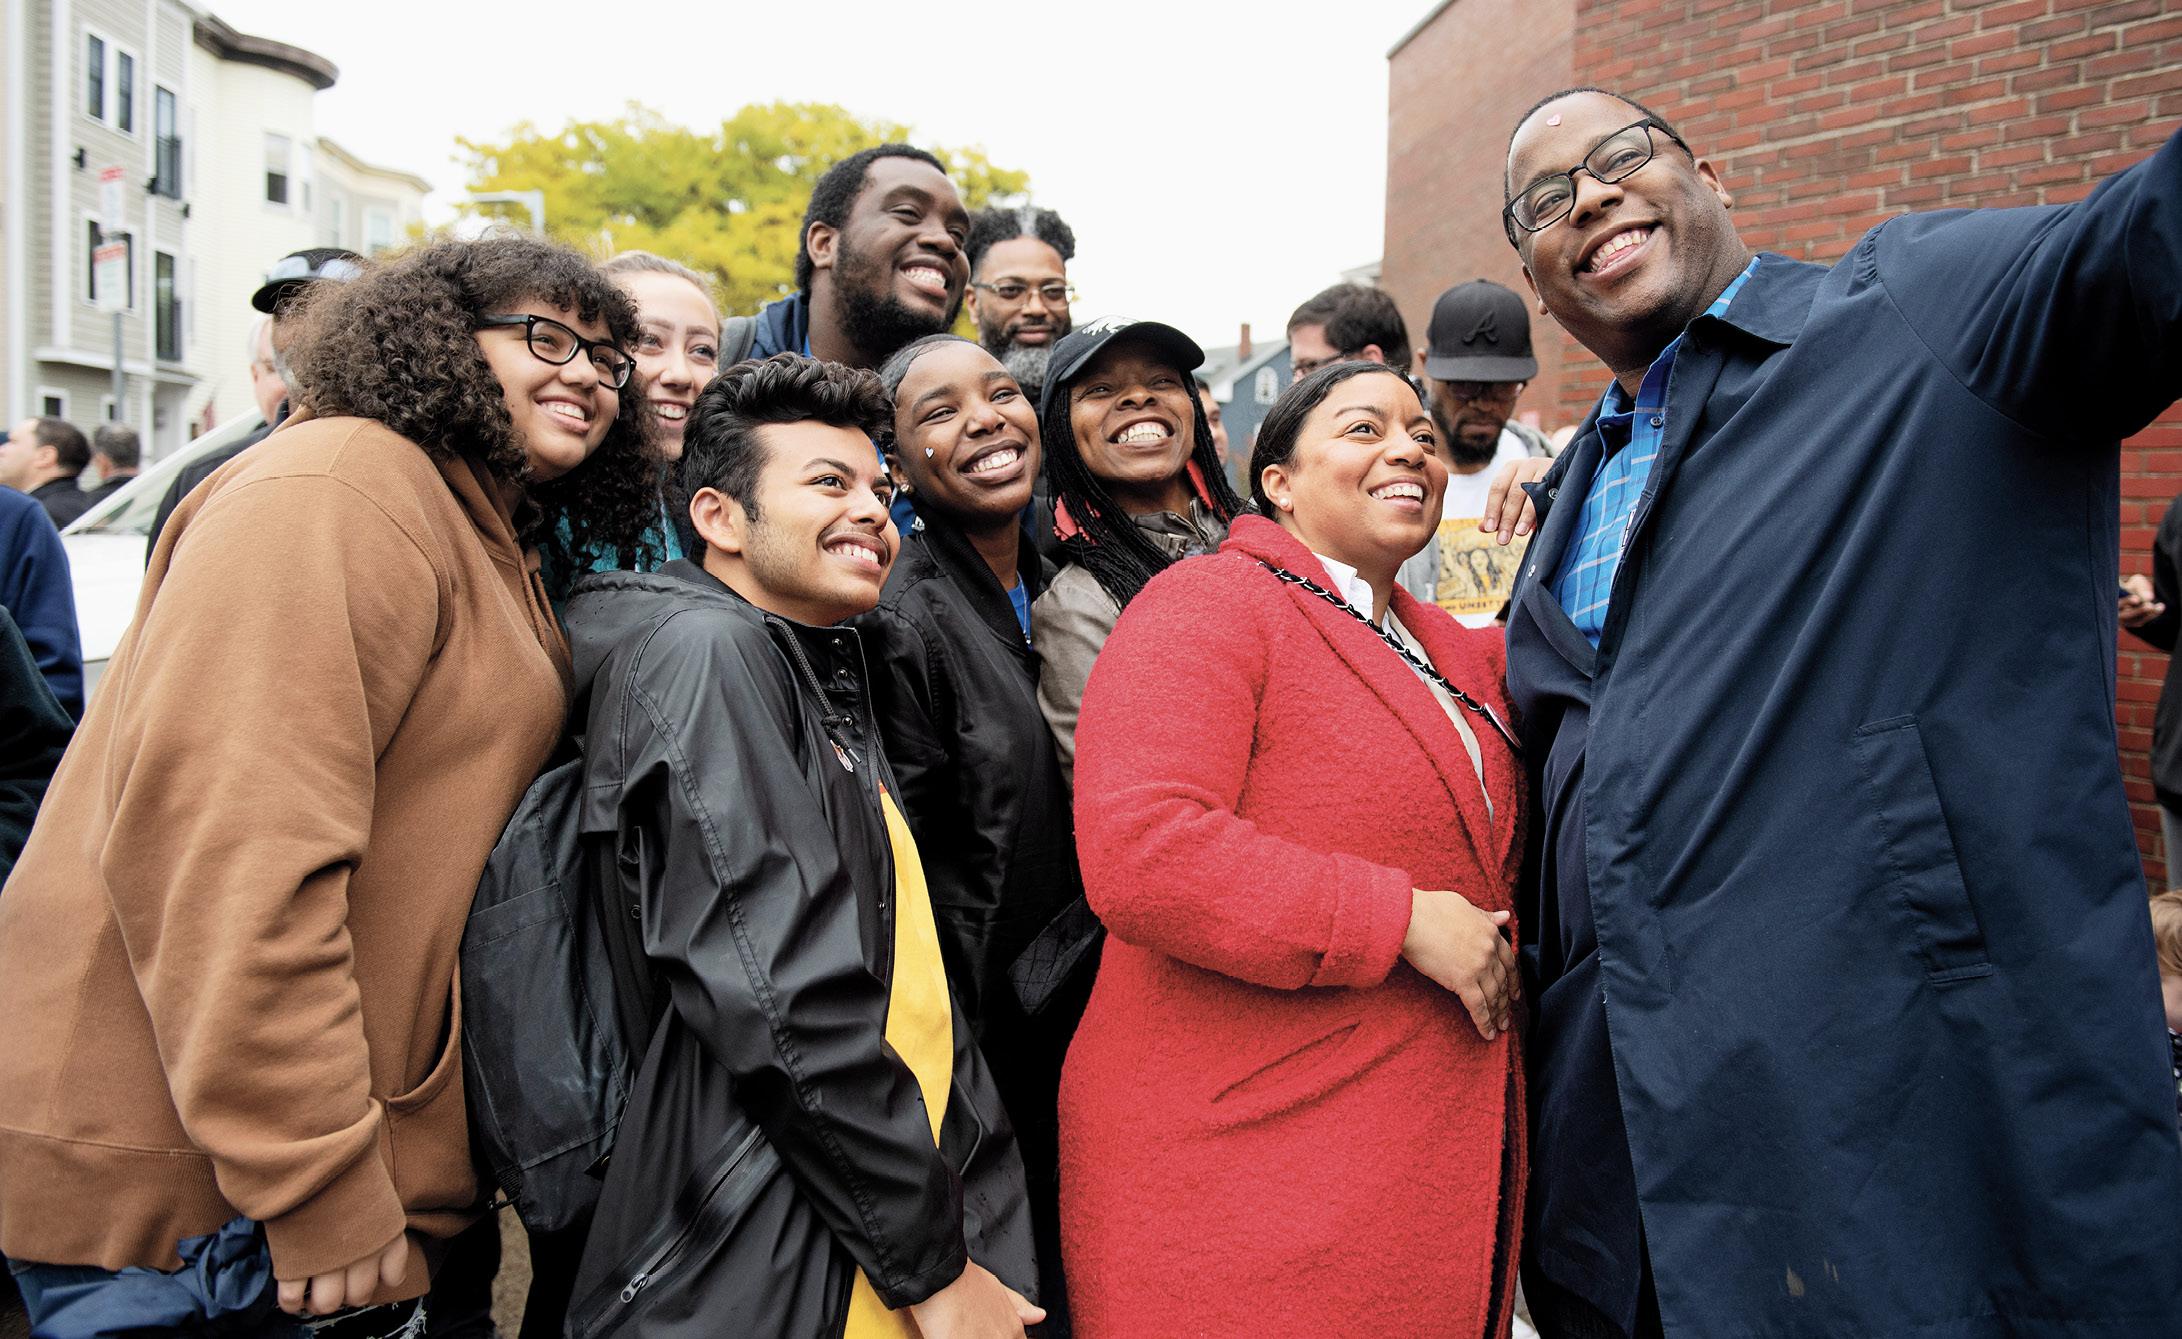 Liz Miranda '02 poses with constituents